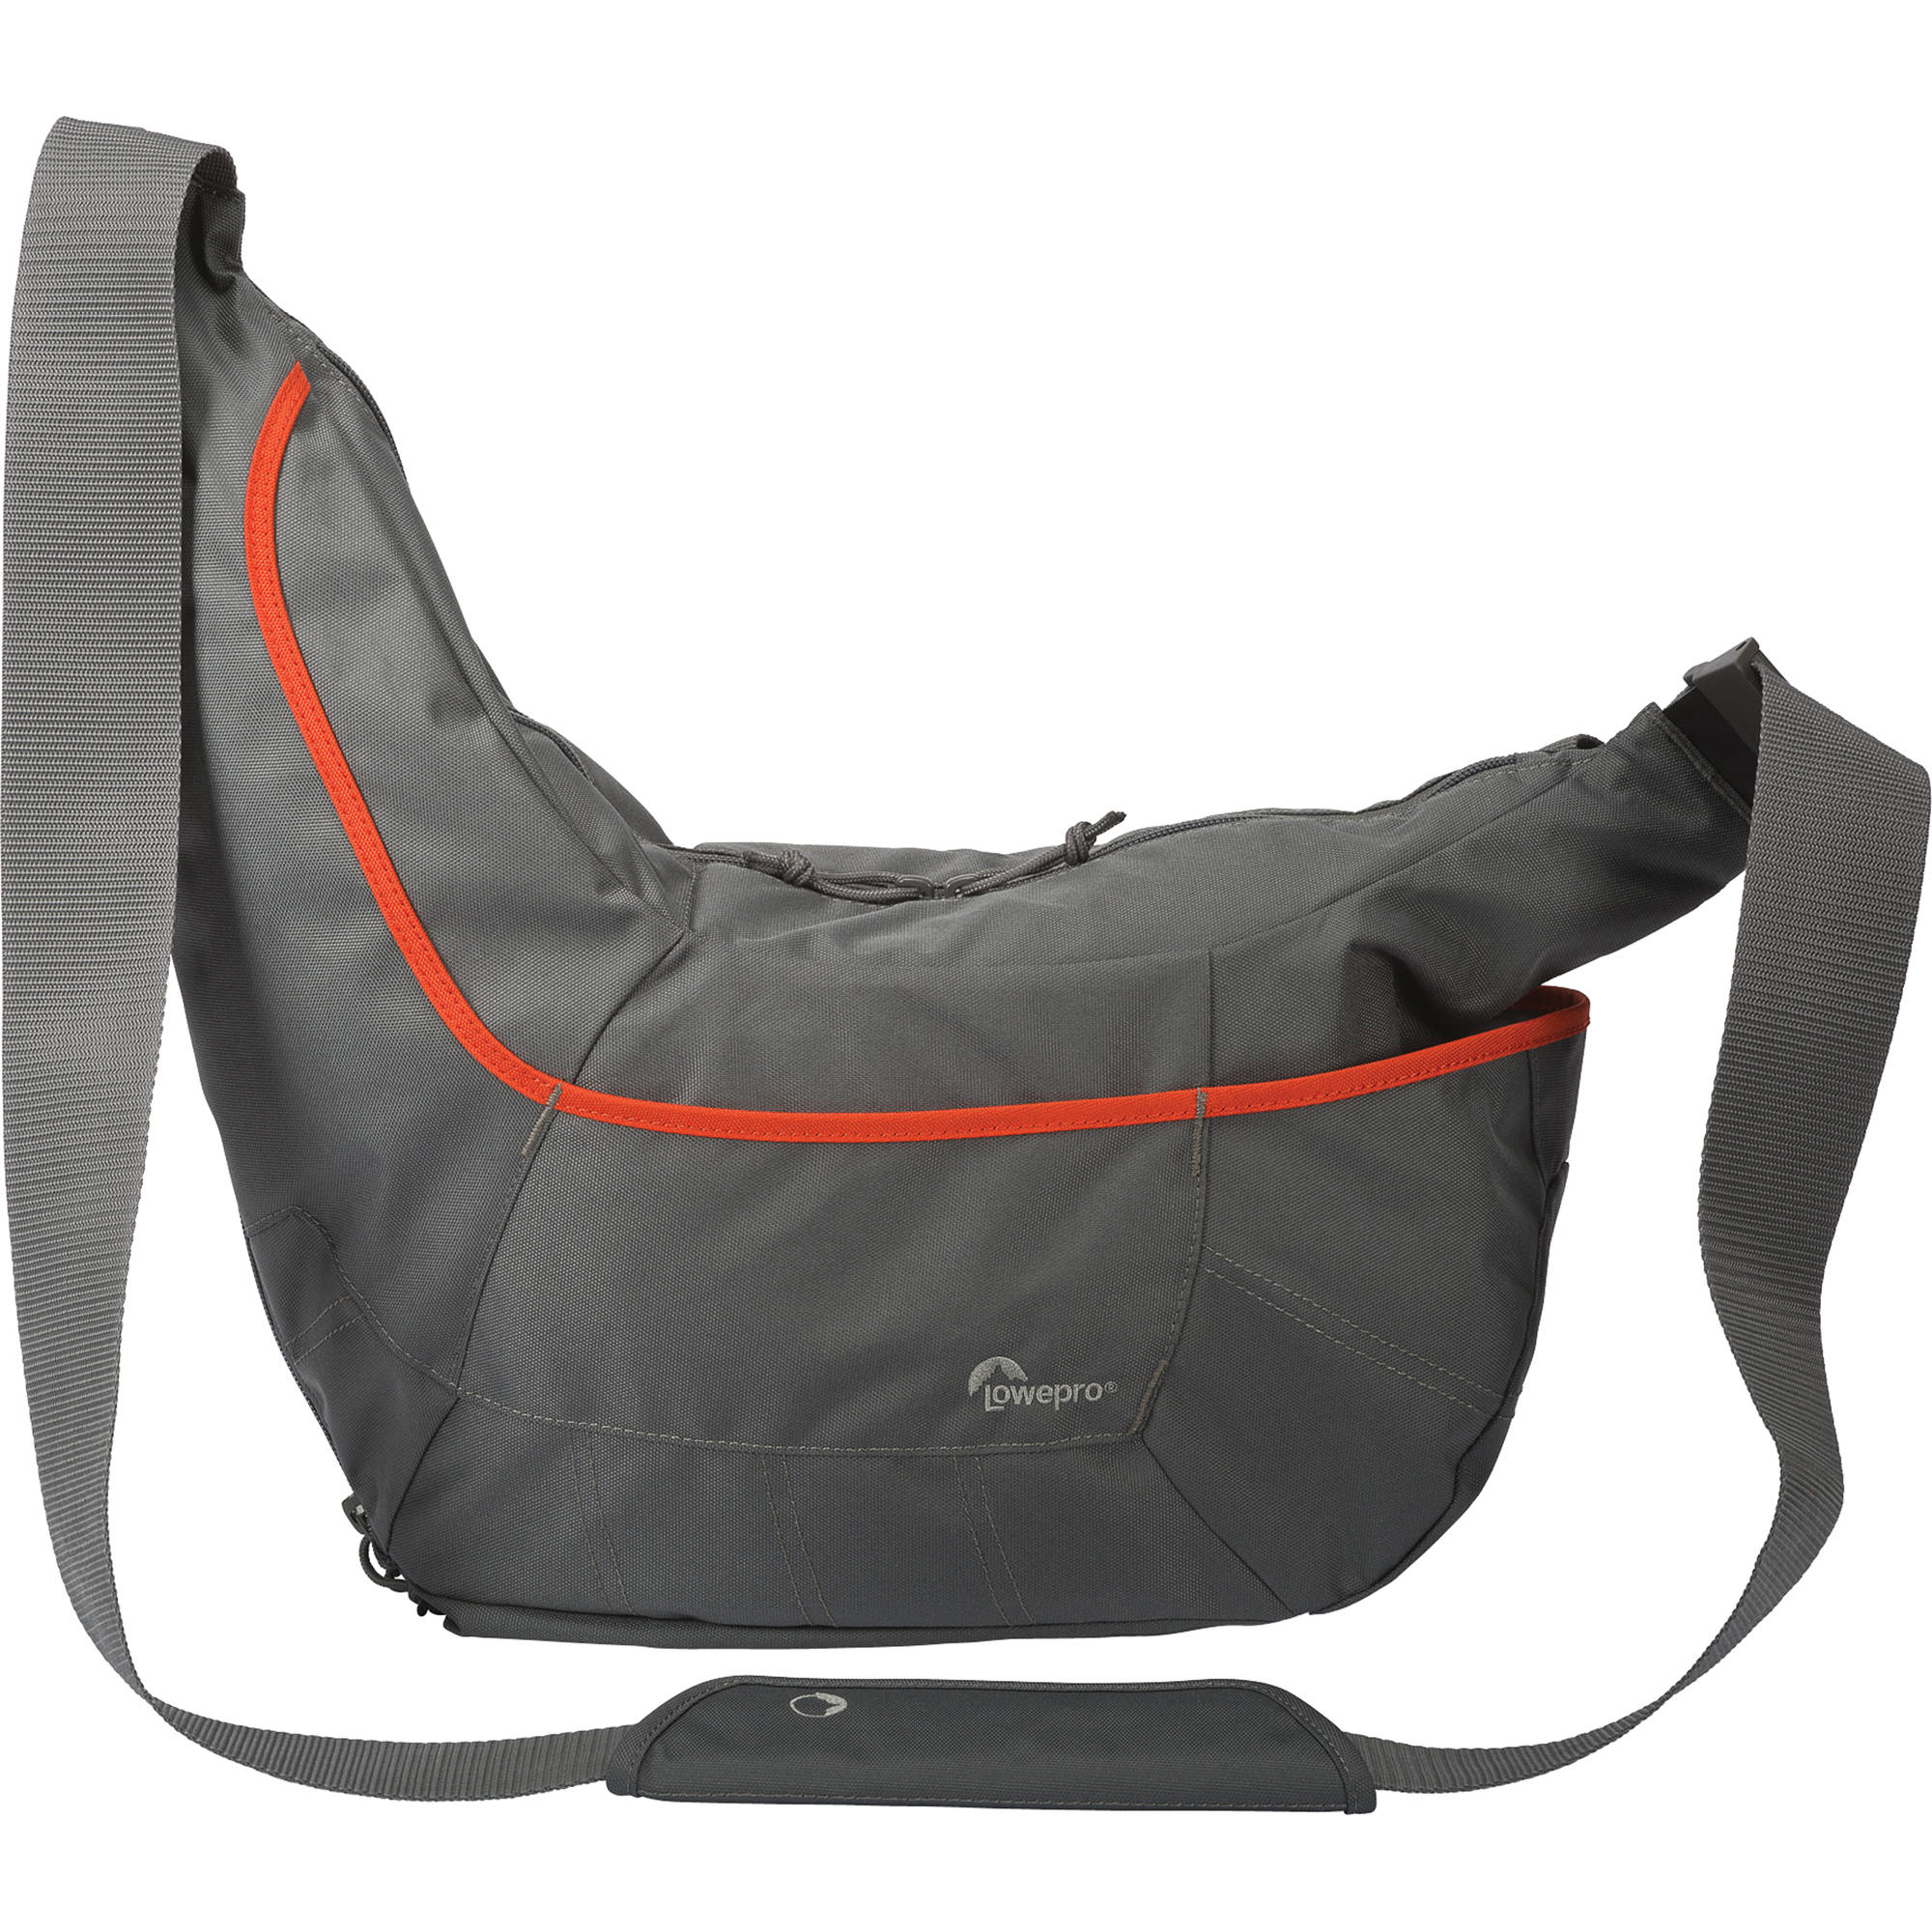 Lowepro Updates Its Successful SlingShot Shoulder Bags